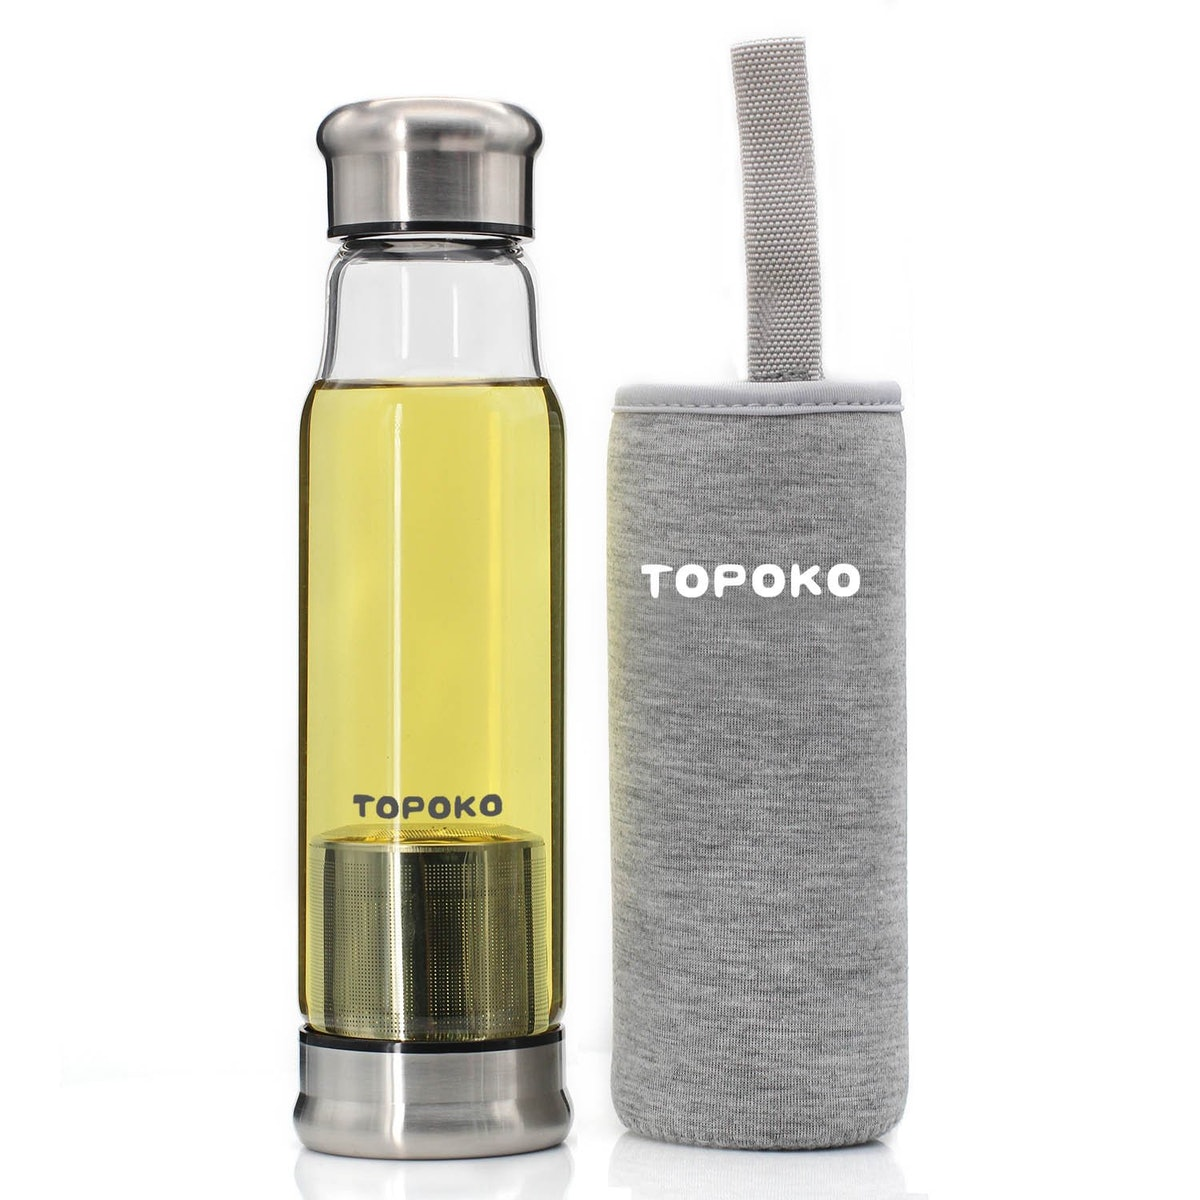 TOPOKO Glass Tea Infuser Mug